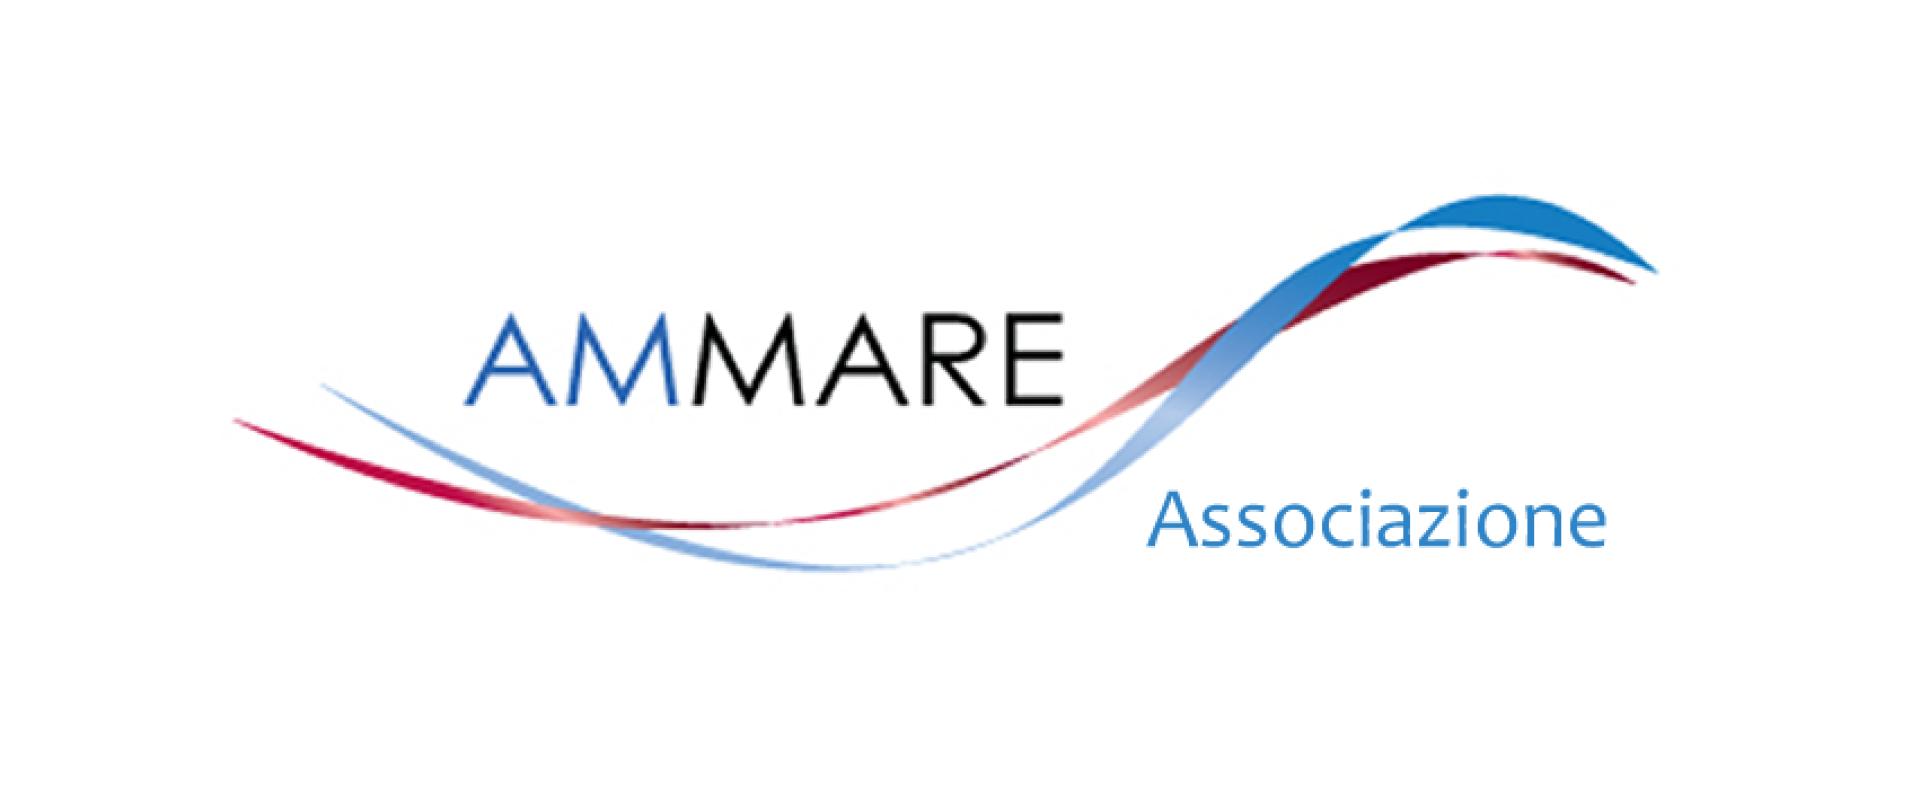 AMMARE Associazione